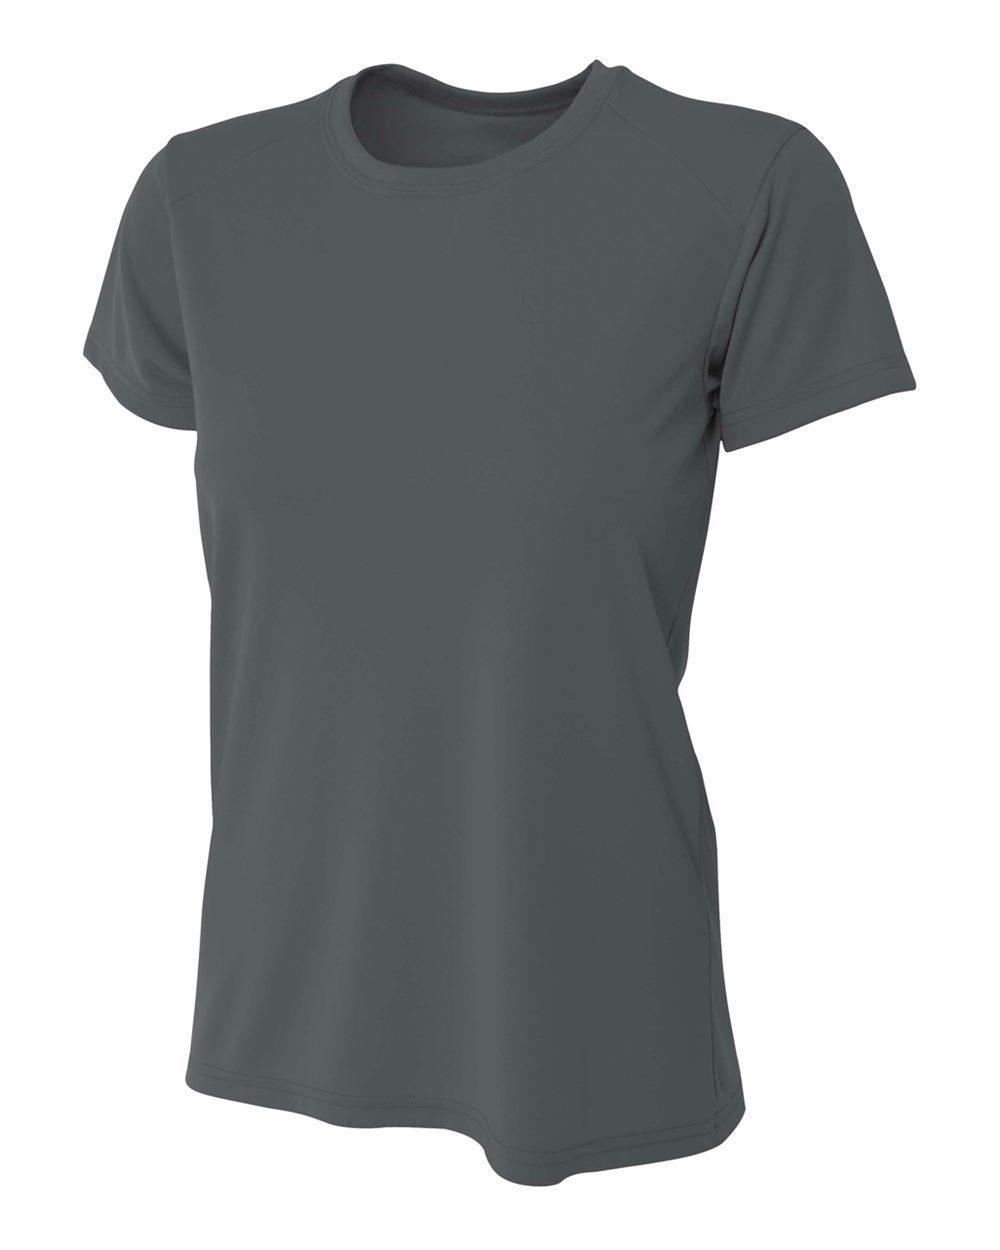 womens-polo-mwicking-graphite.jpg